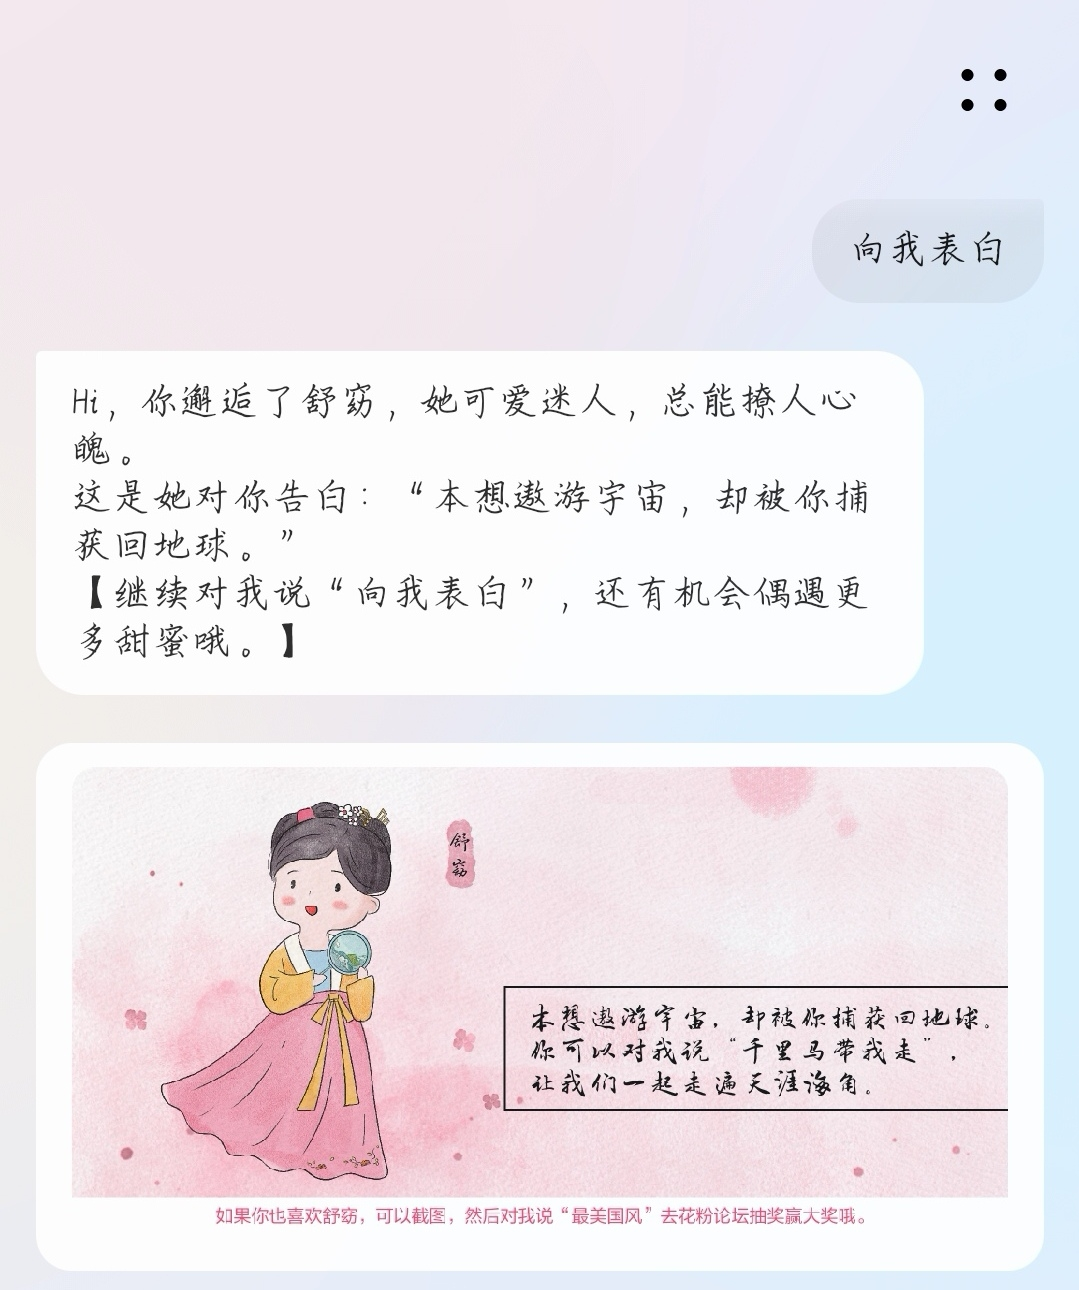 Screenshot_20210611_180033_com.huawei.vassistant_edit_62065362734799.jpg